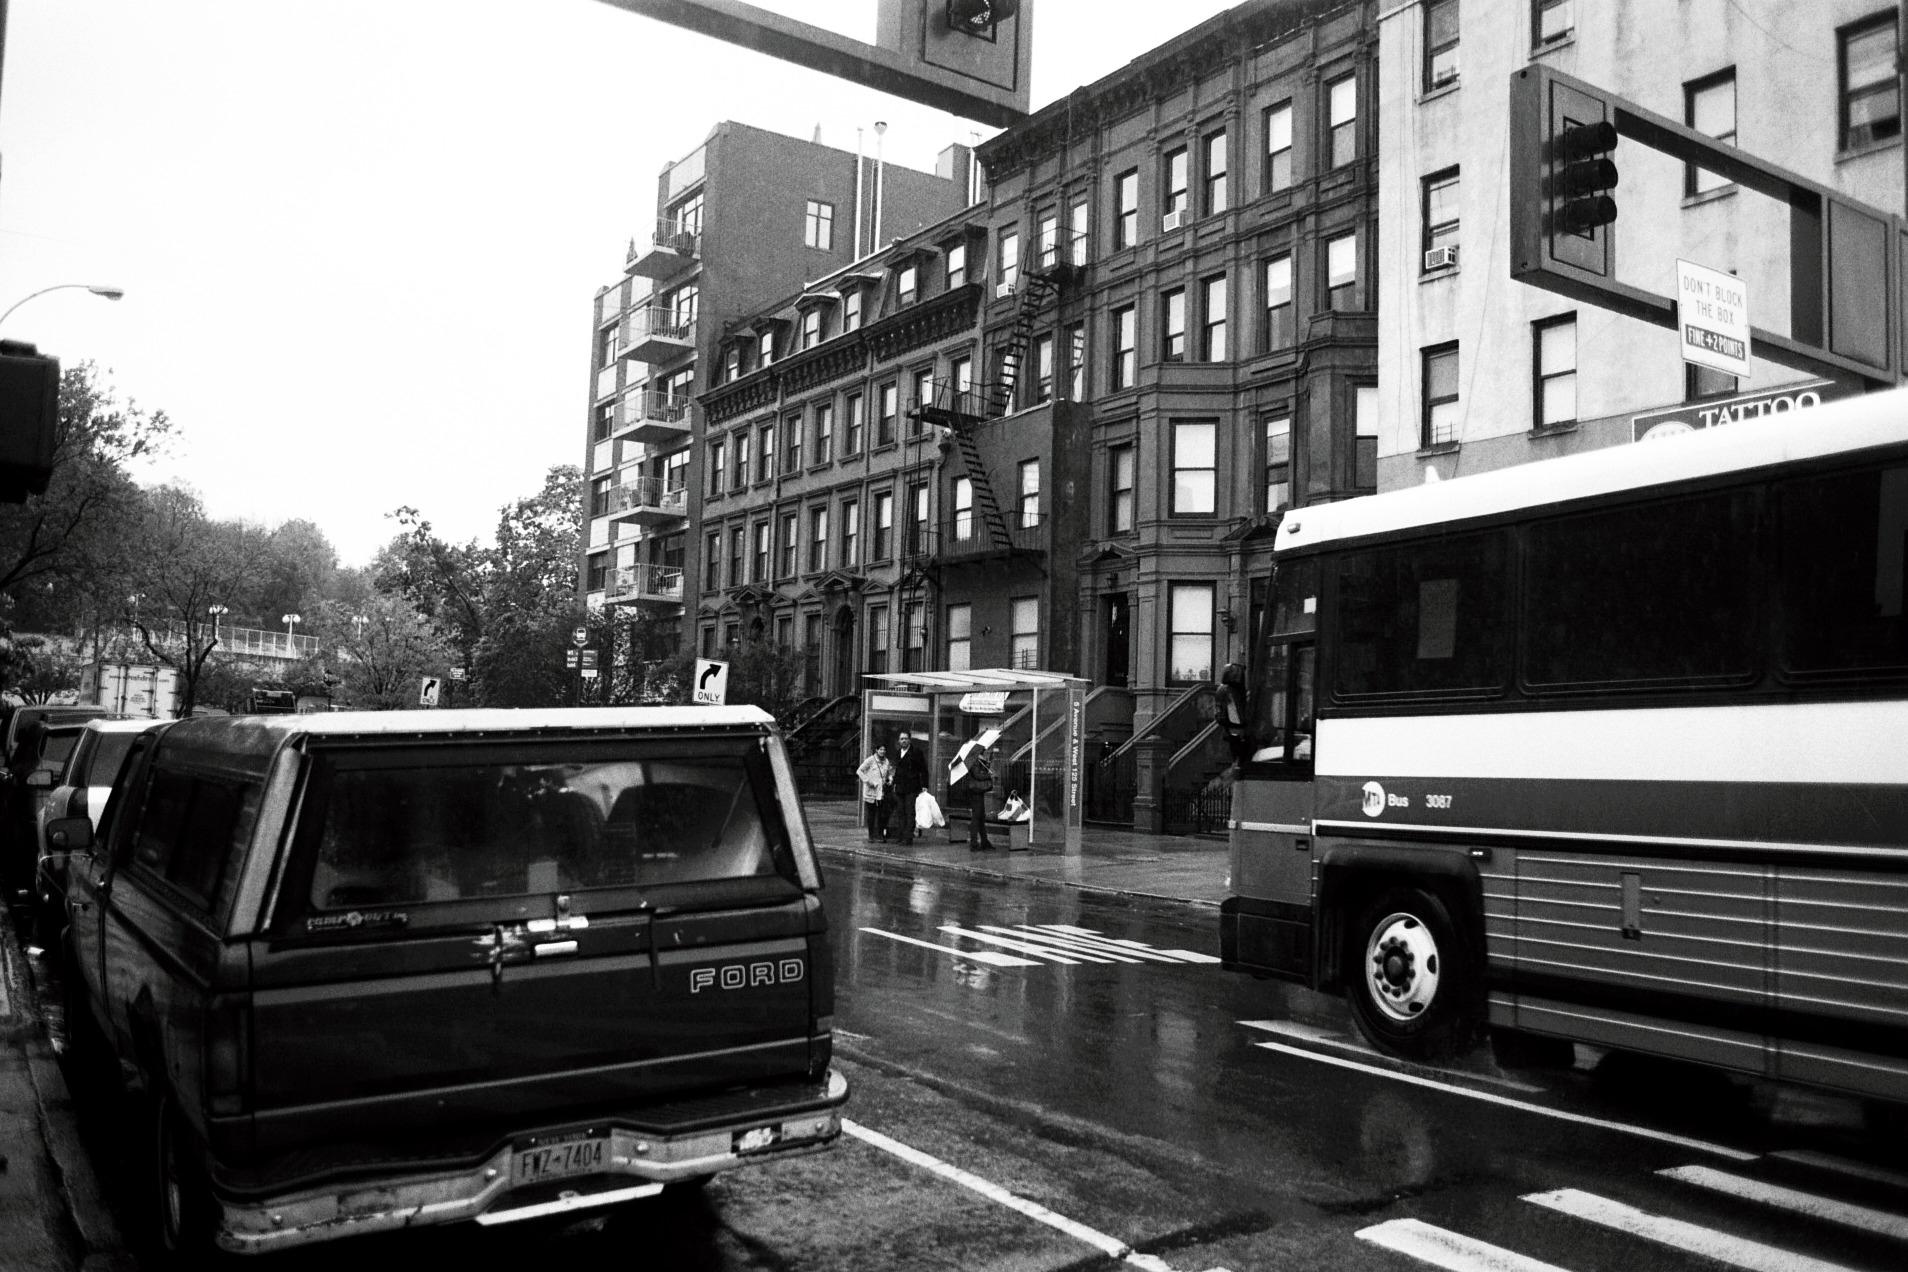 04_CANON_EOS_1N_BW_Harlem_NYC_copyright_thomasApp.jpg